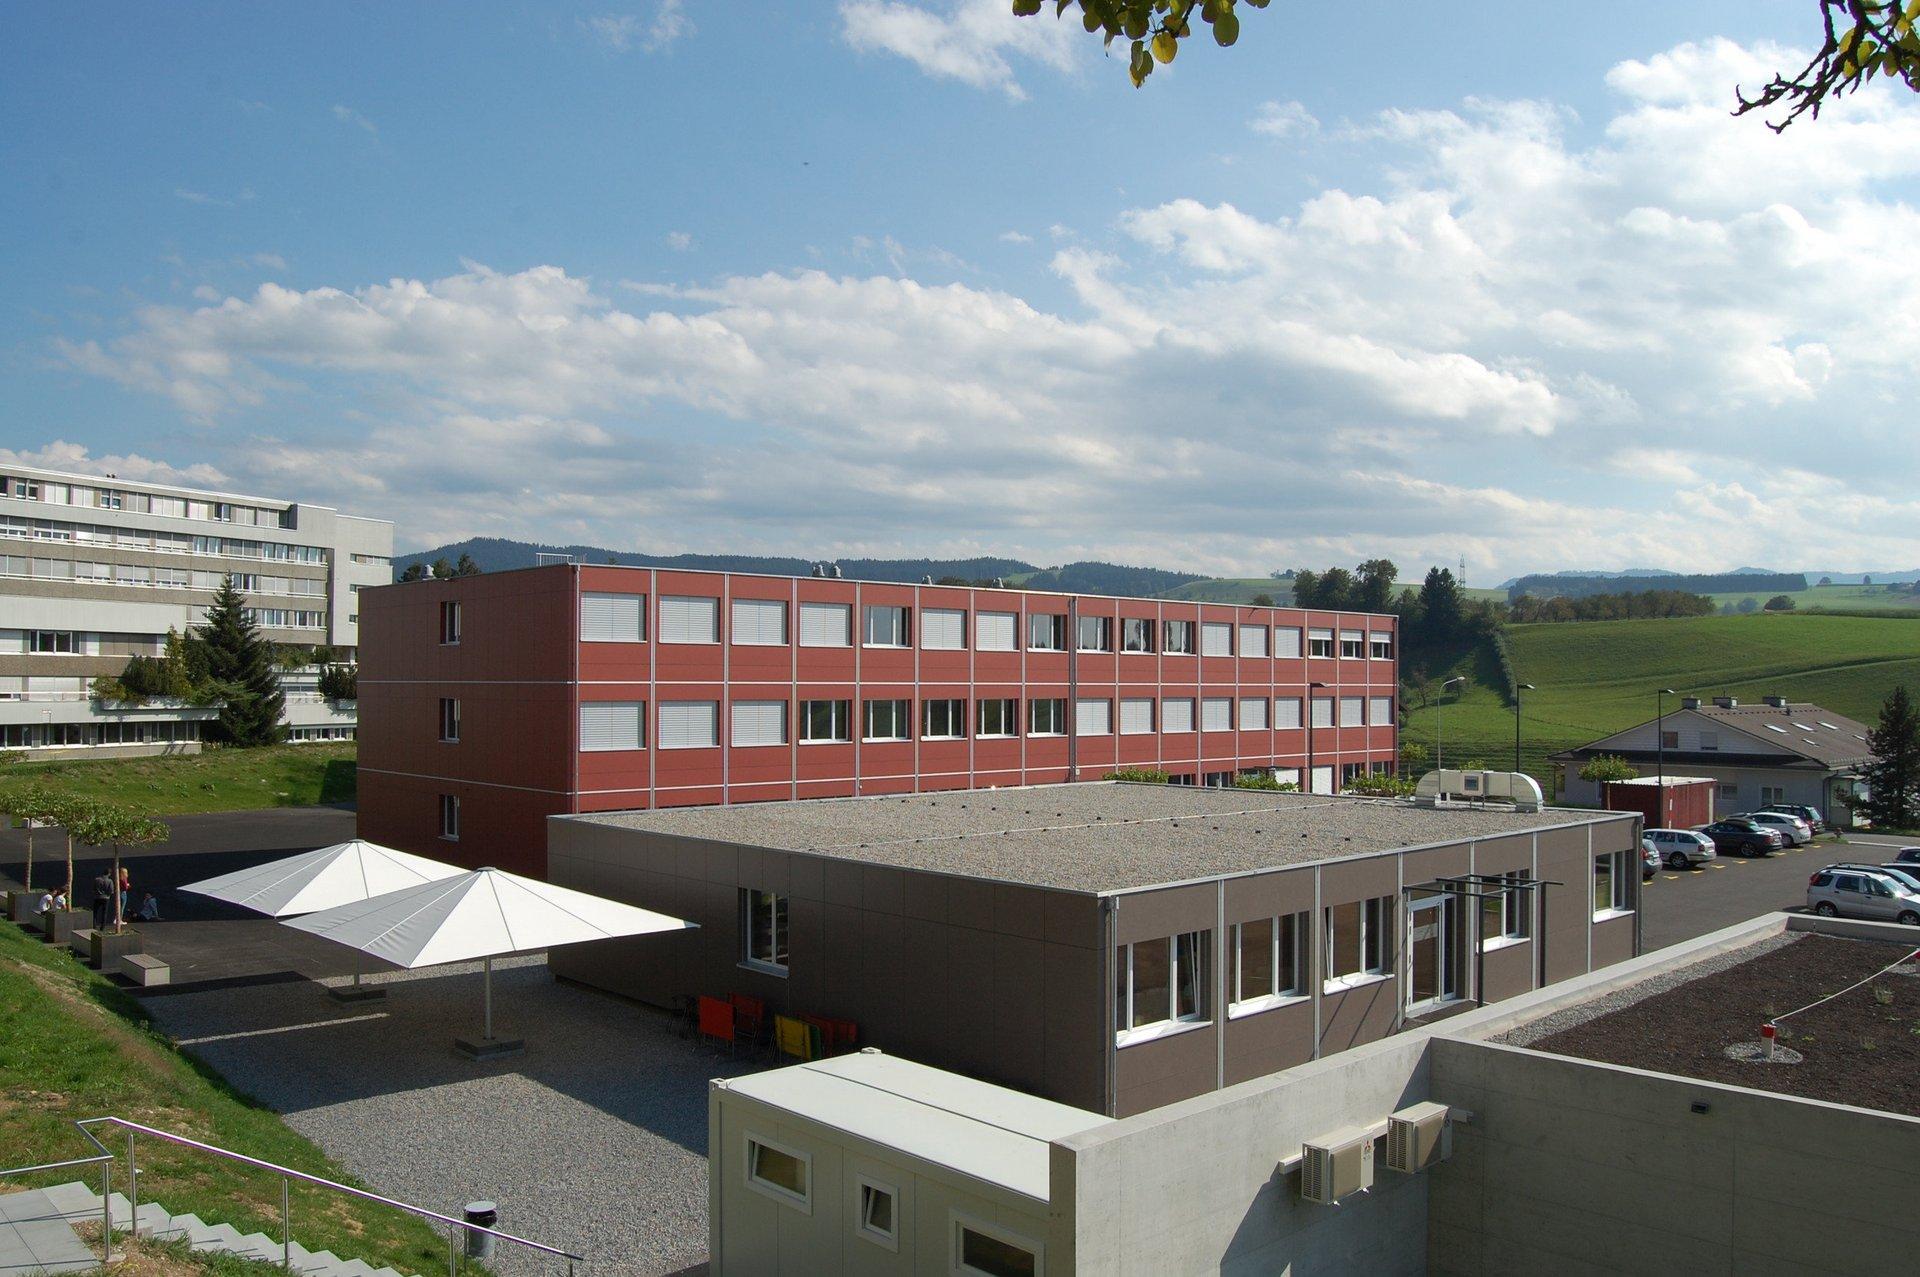 3-geschossiges Schulgebäude mit 1-geschossigem Gebäude davor